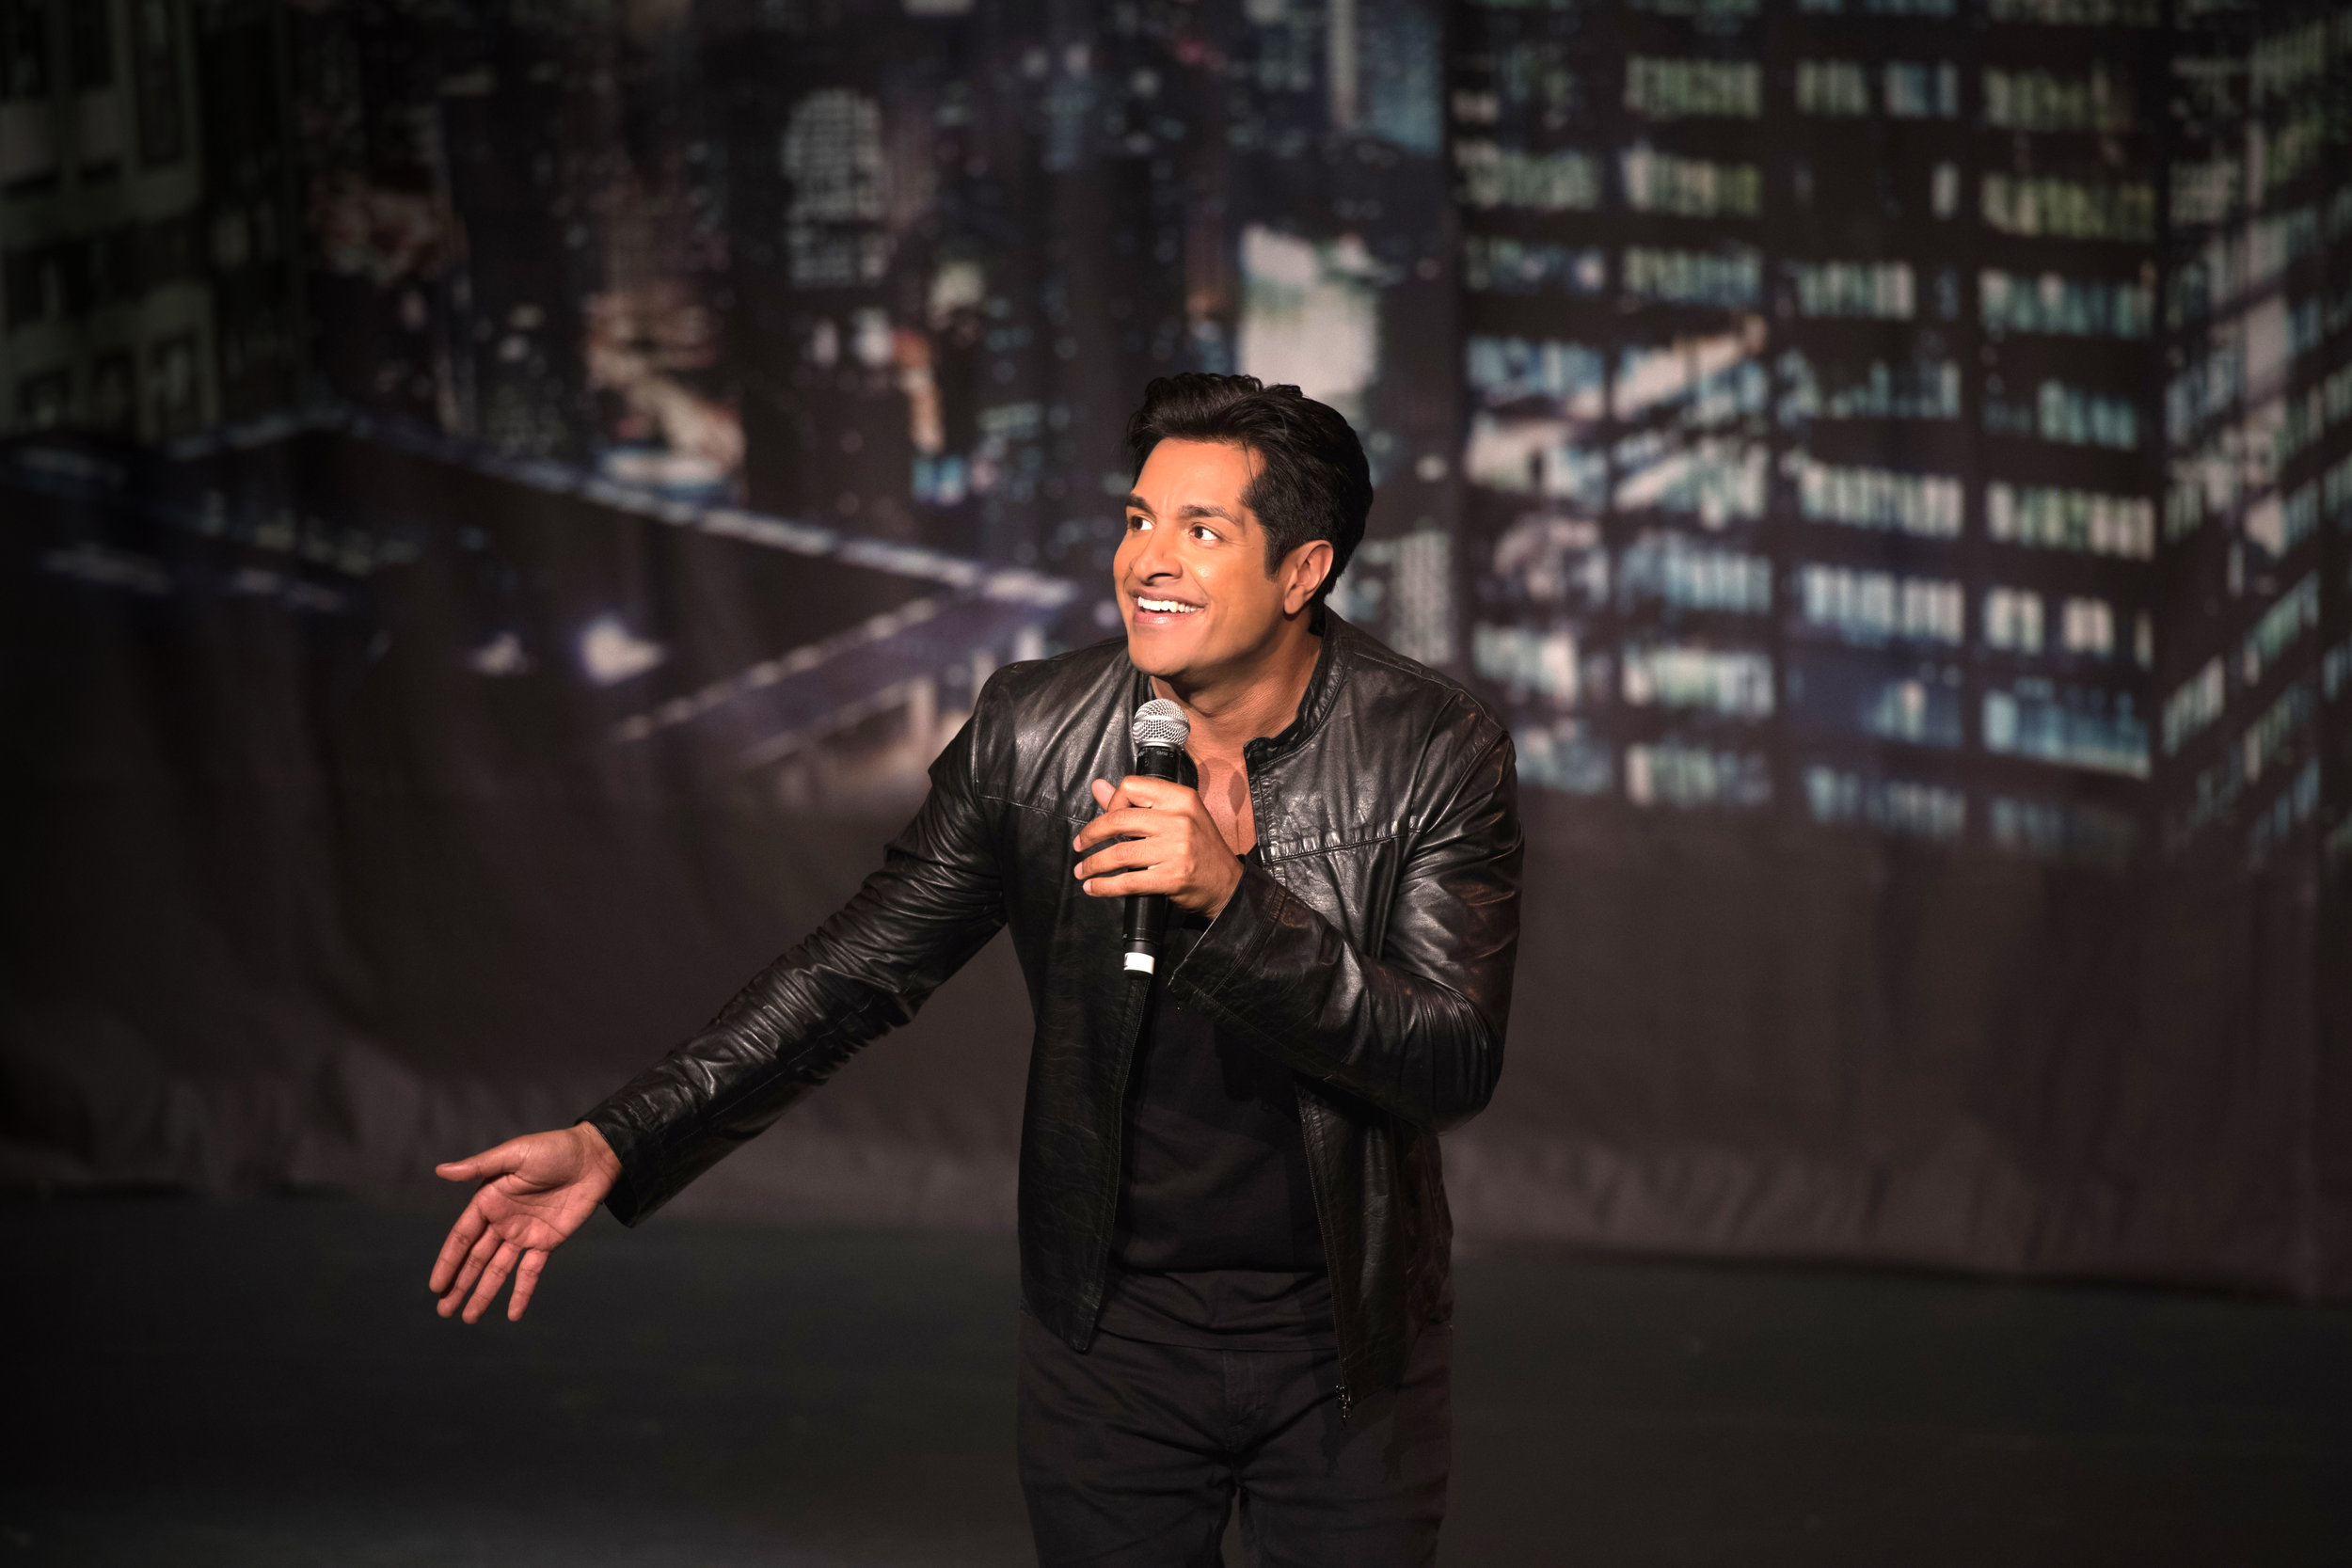 Comedy superstar Sugar Sammy returns to perform live in Ontario.